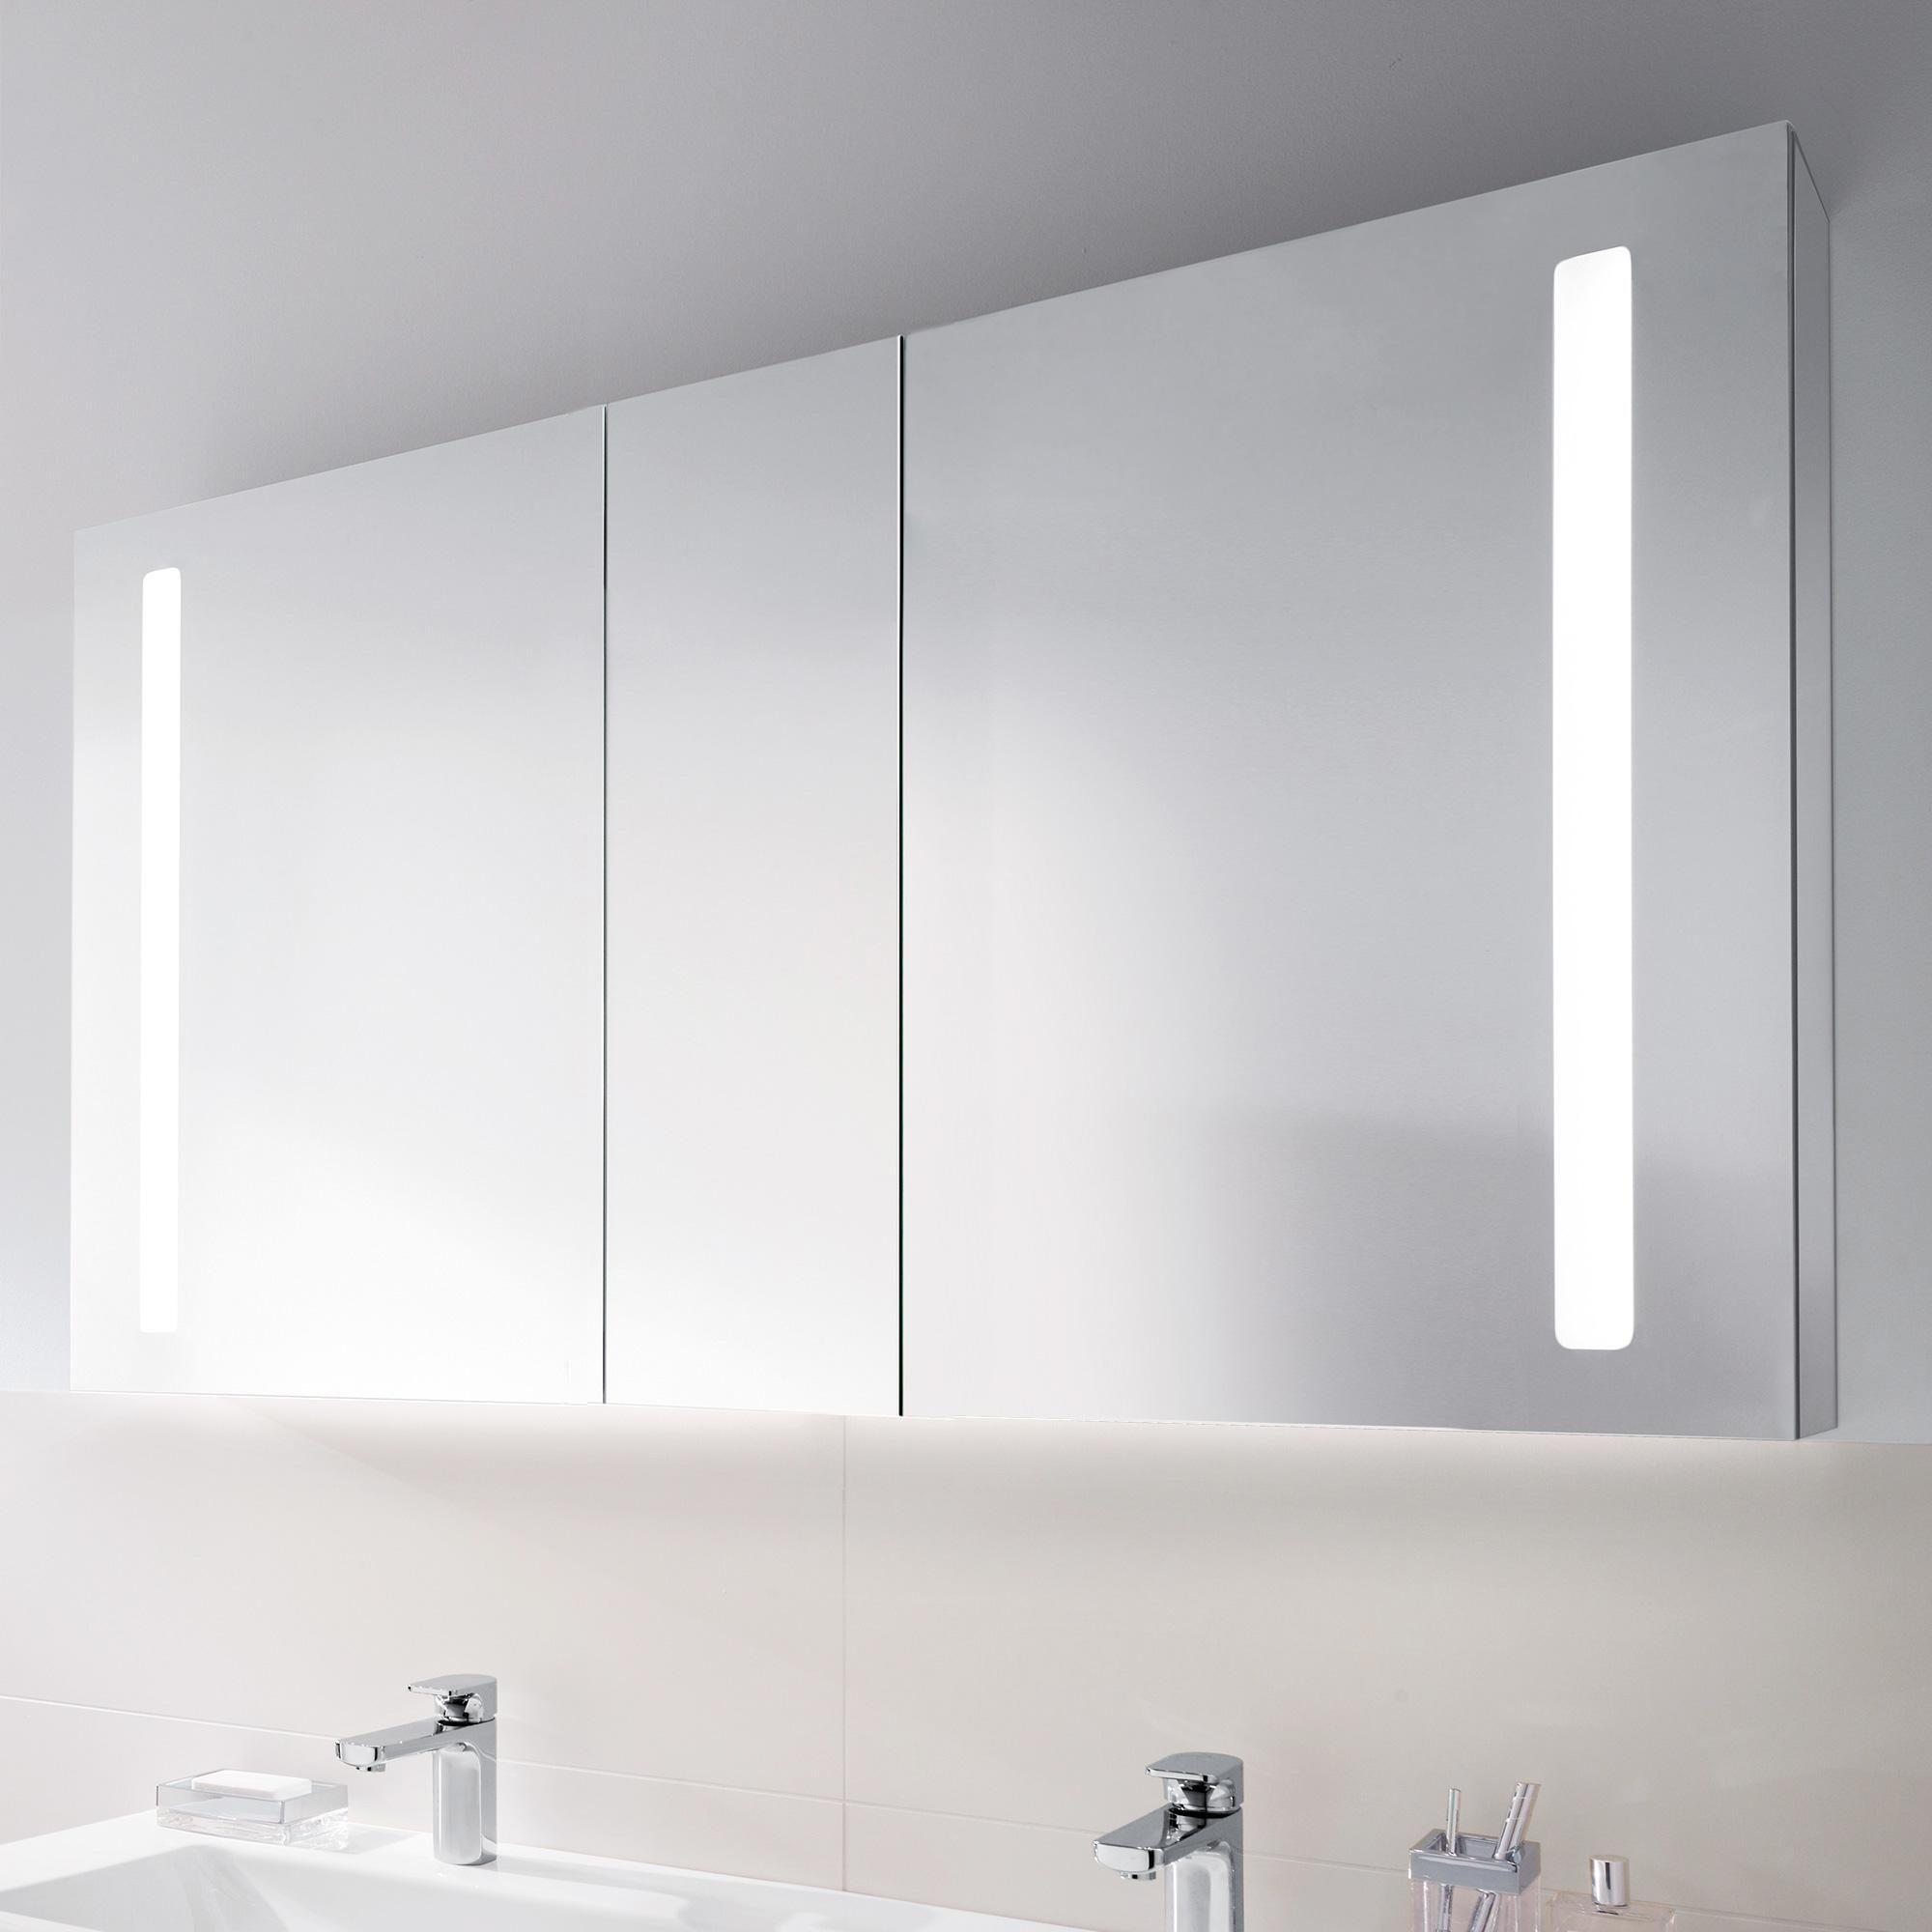 Badezimmer Spiegelschrank Badezimmer Spiegelschrank Ikea 30 Inspirierend Ikea Badspiegelschrank Spiegelschrank Badezimmer Spiegelschrank